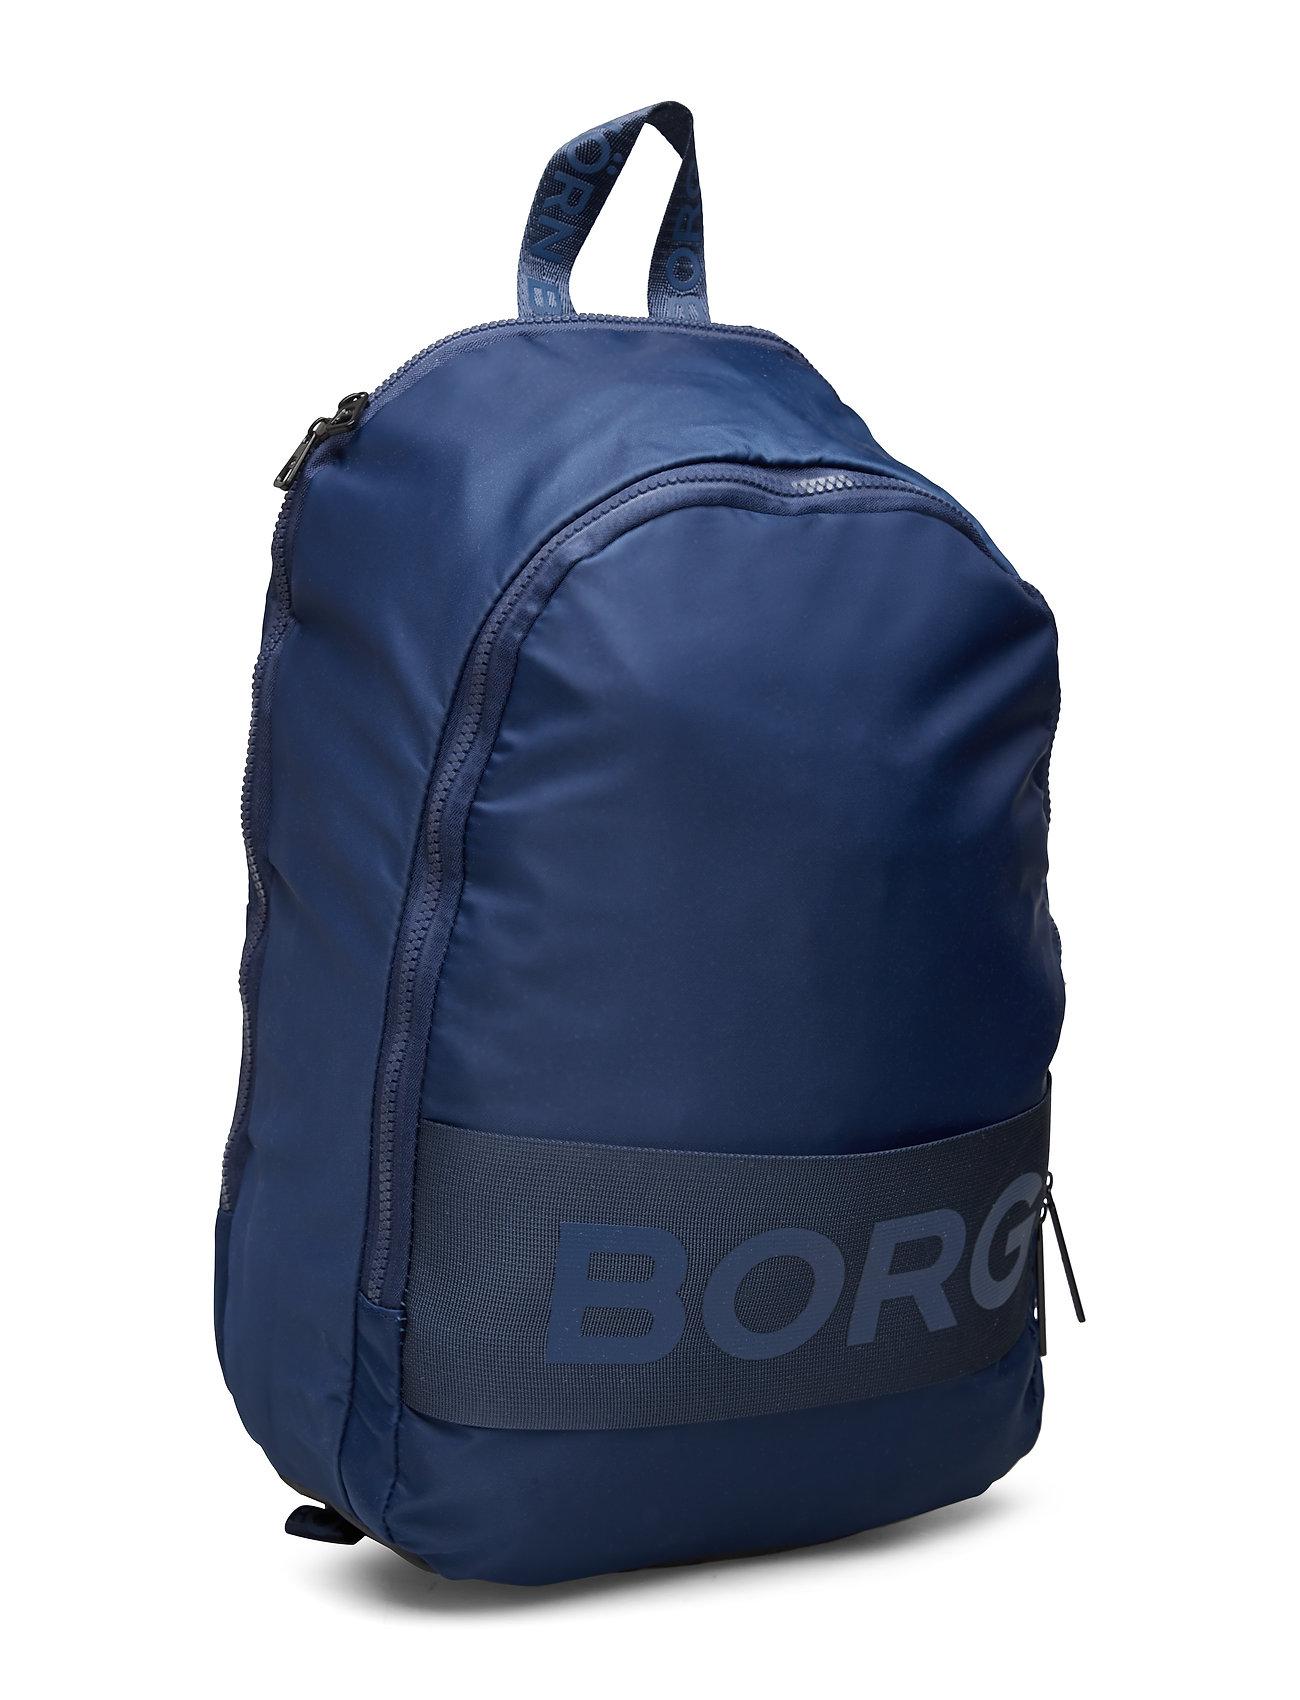 Bags CoconavyBjörn Borg CoconavyBjörn Borg CoconavyBjörn Bags ZPXiOukT